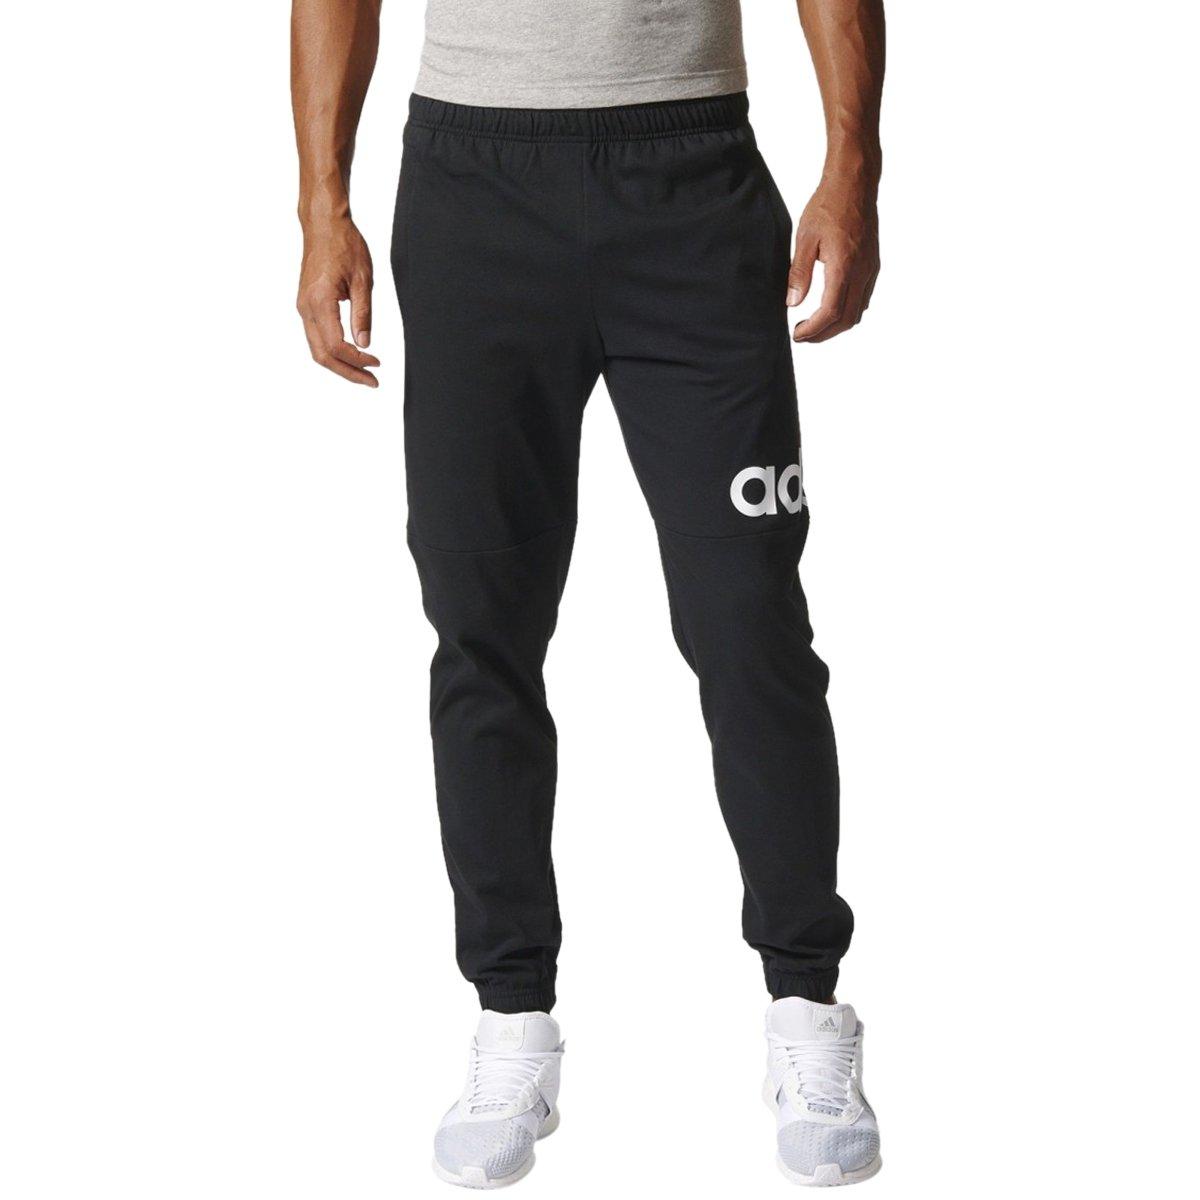 a4d89c88e63 Bizz Store - Calça Masculina Adidas Essentials Performance Logo